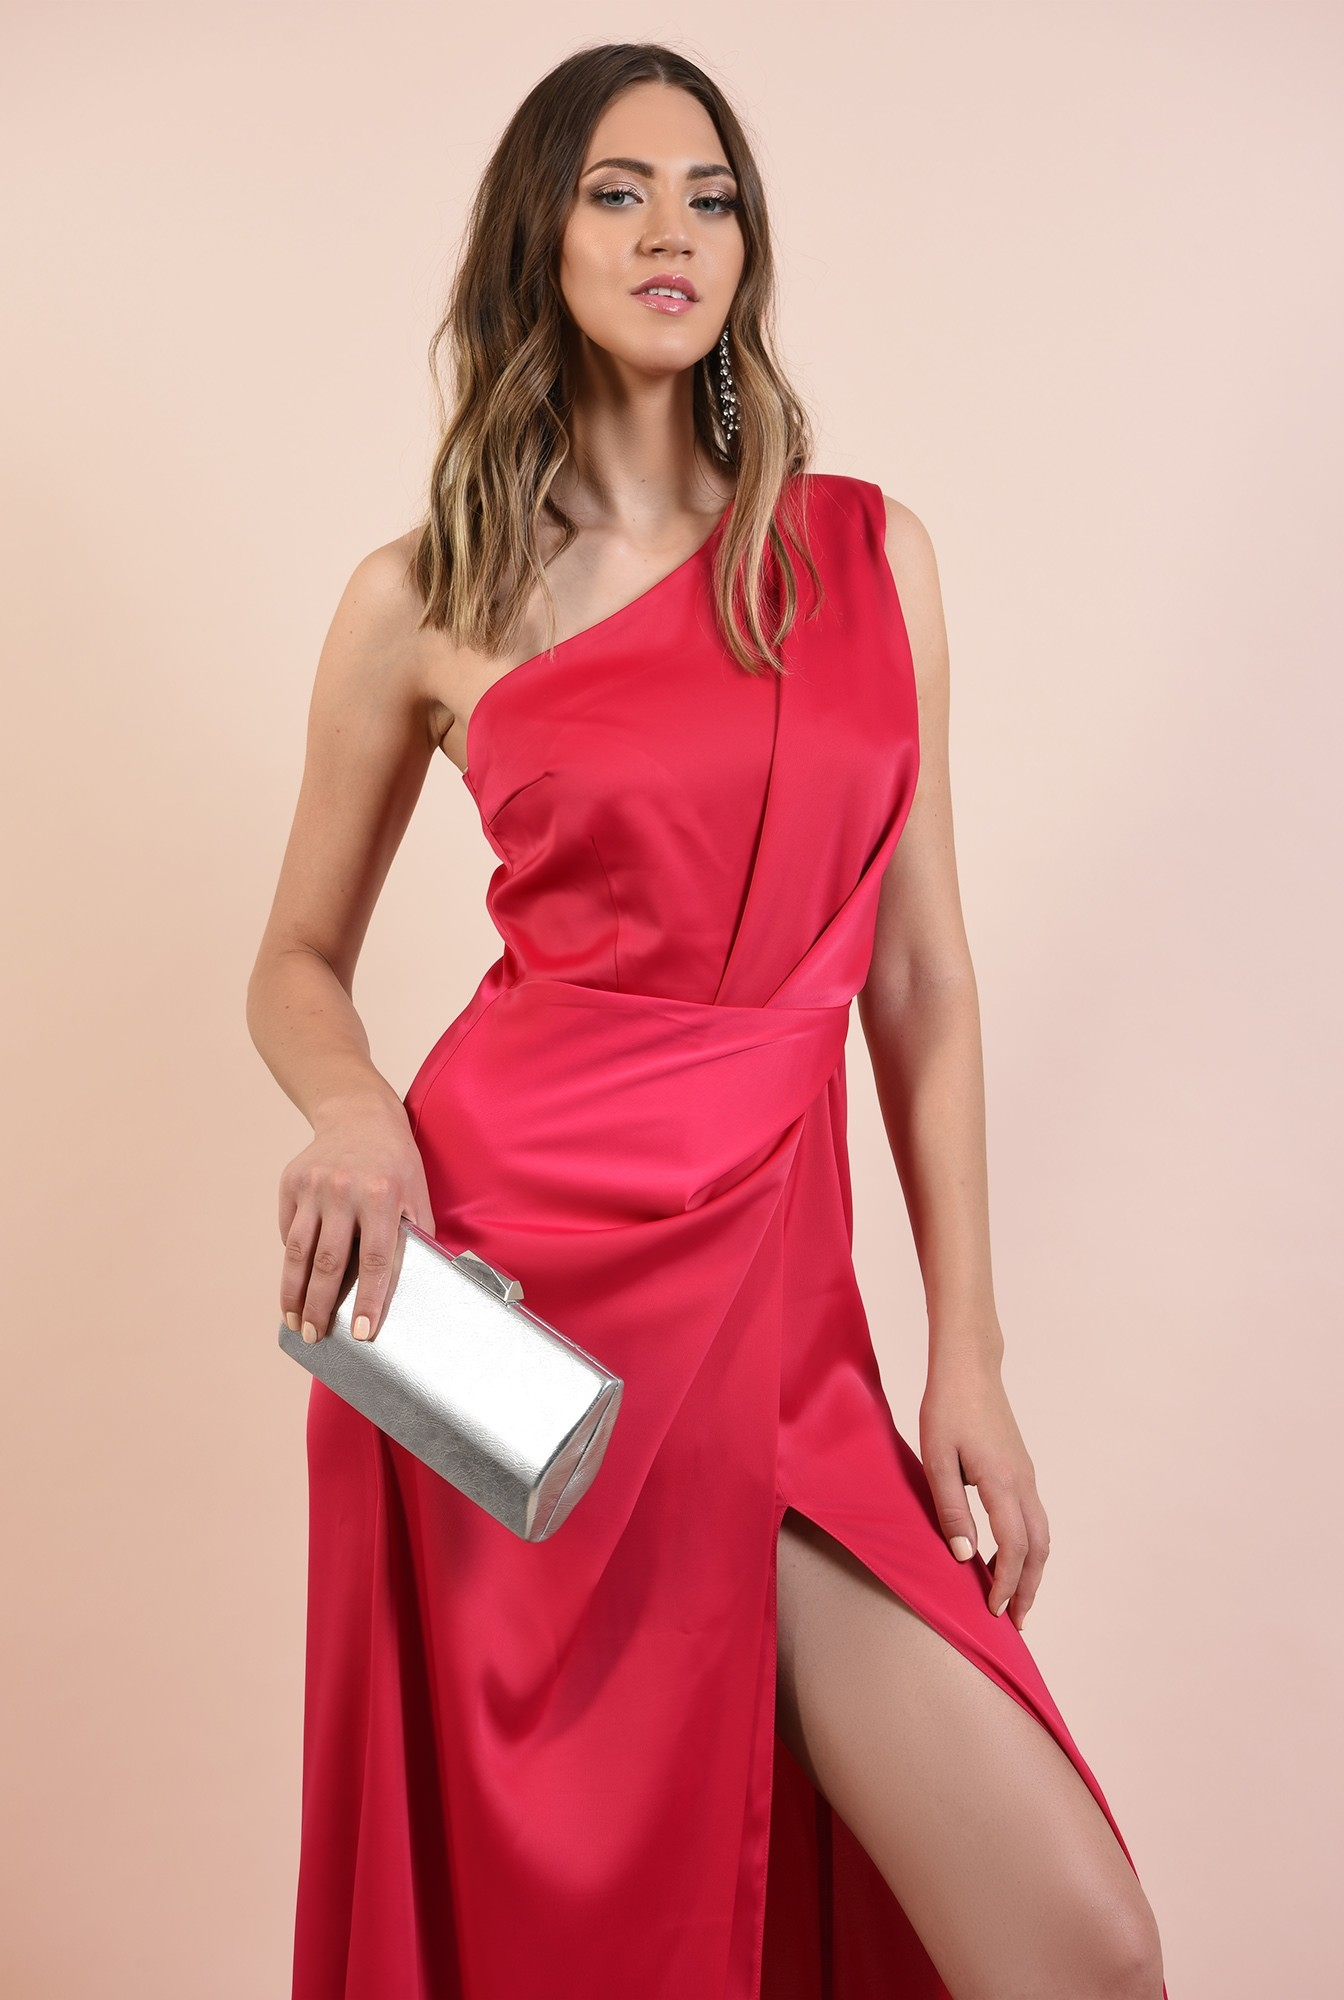 0 - rochie eleganta, lunga, cu slit adanc, cusatura in talie